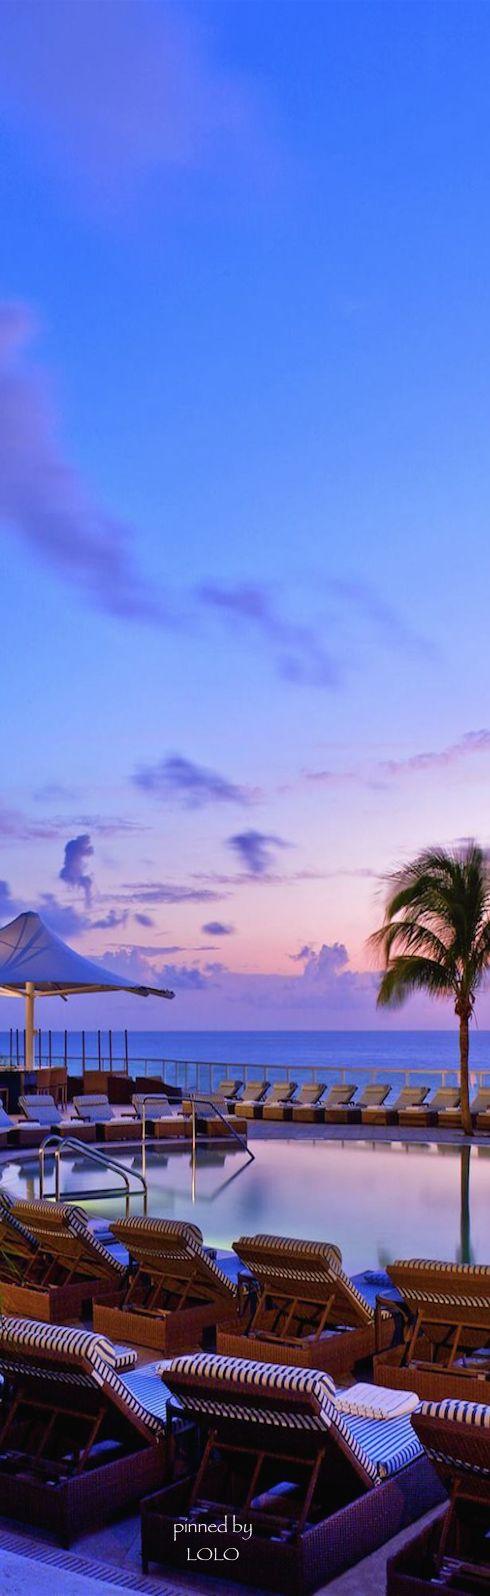 Ritz Carlton Fort Lauderdale, Florida